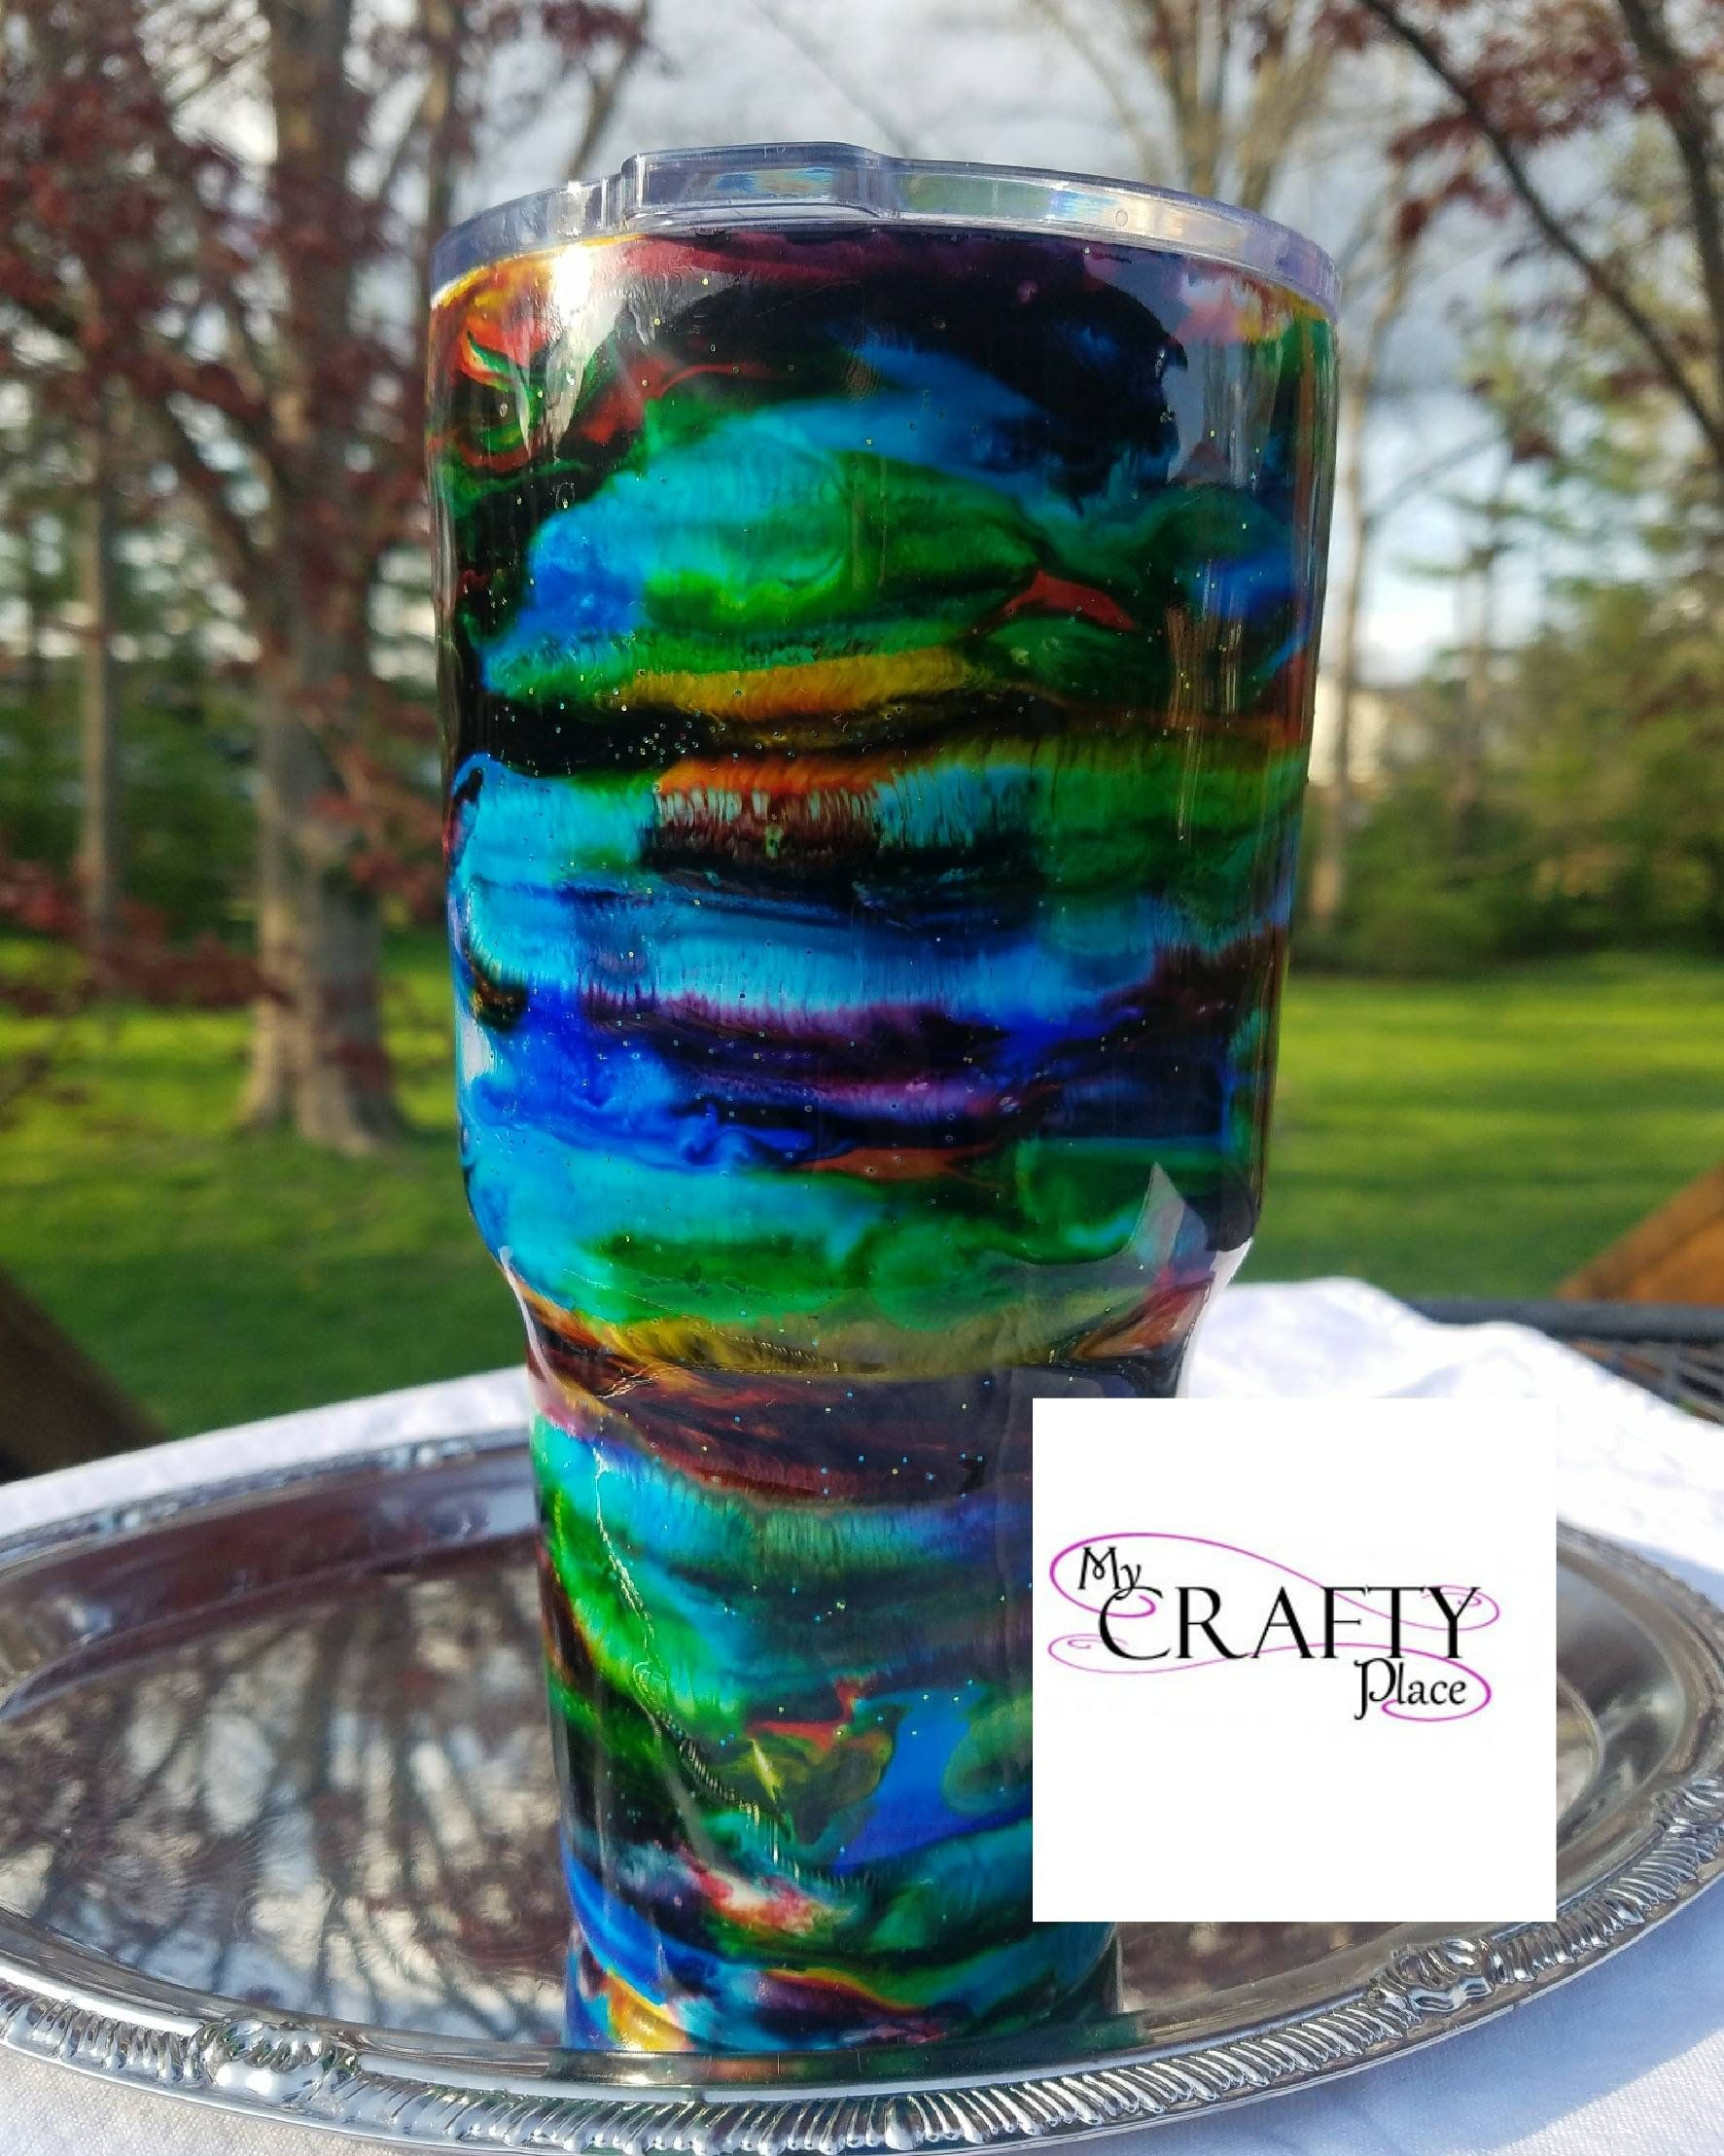 30 oz rainbow swirl painted tumbler alcohol ink tumbler